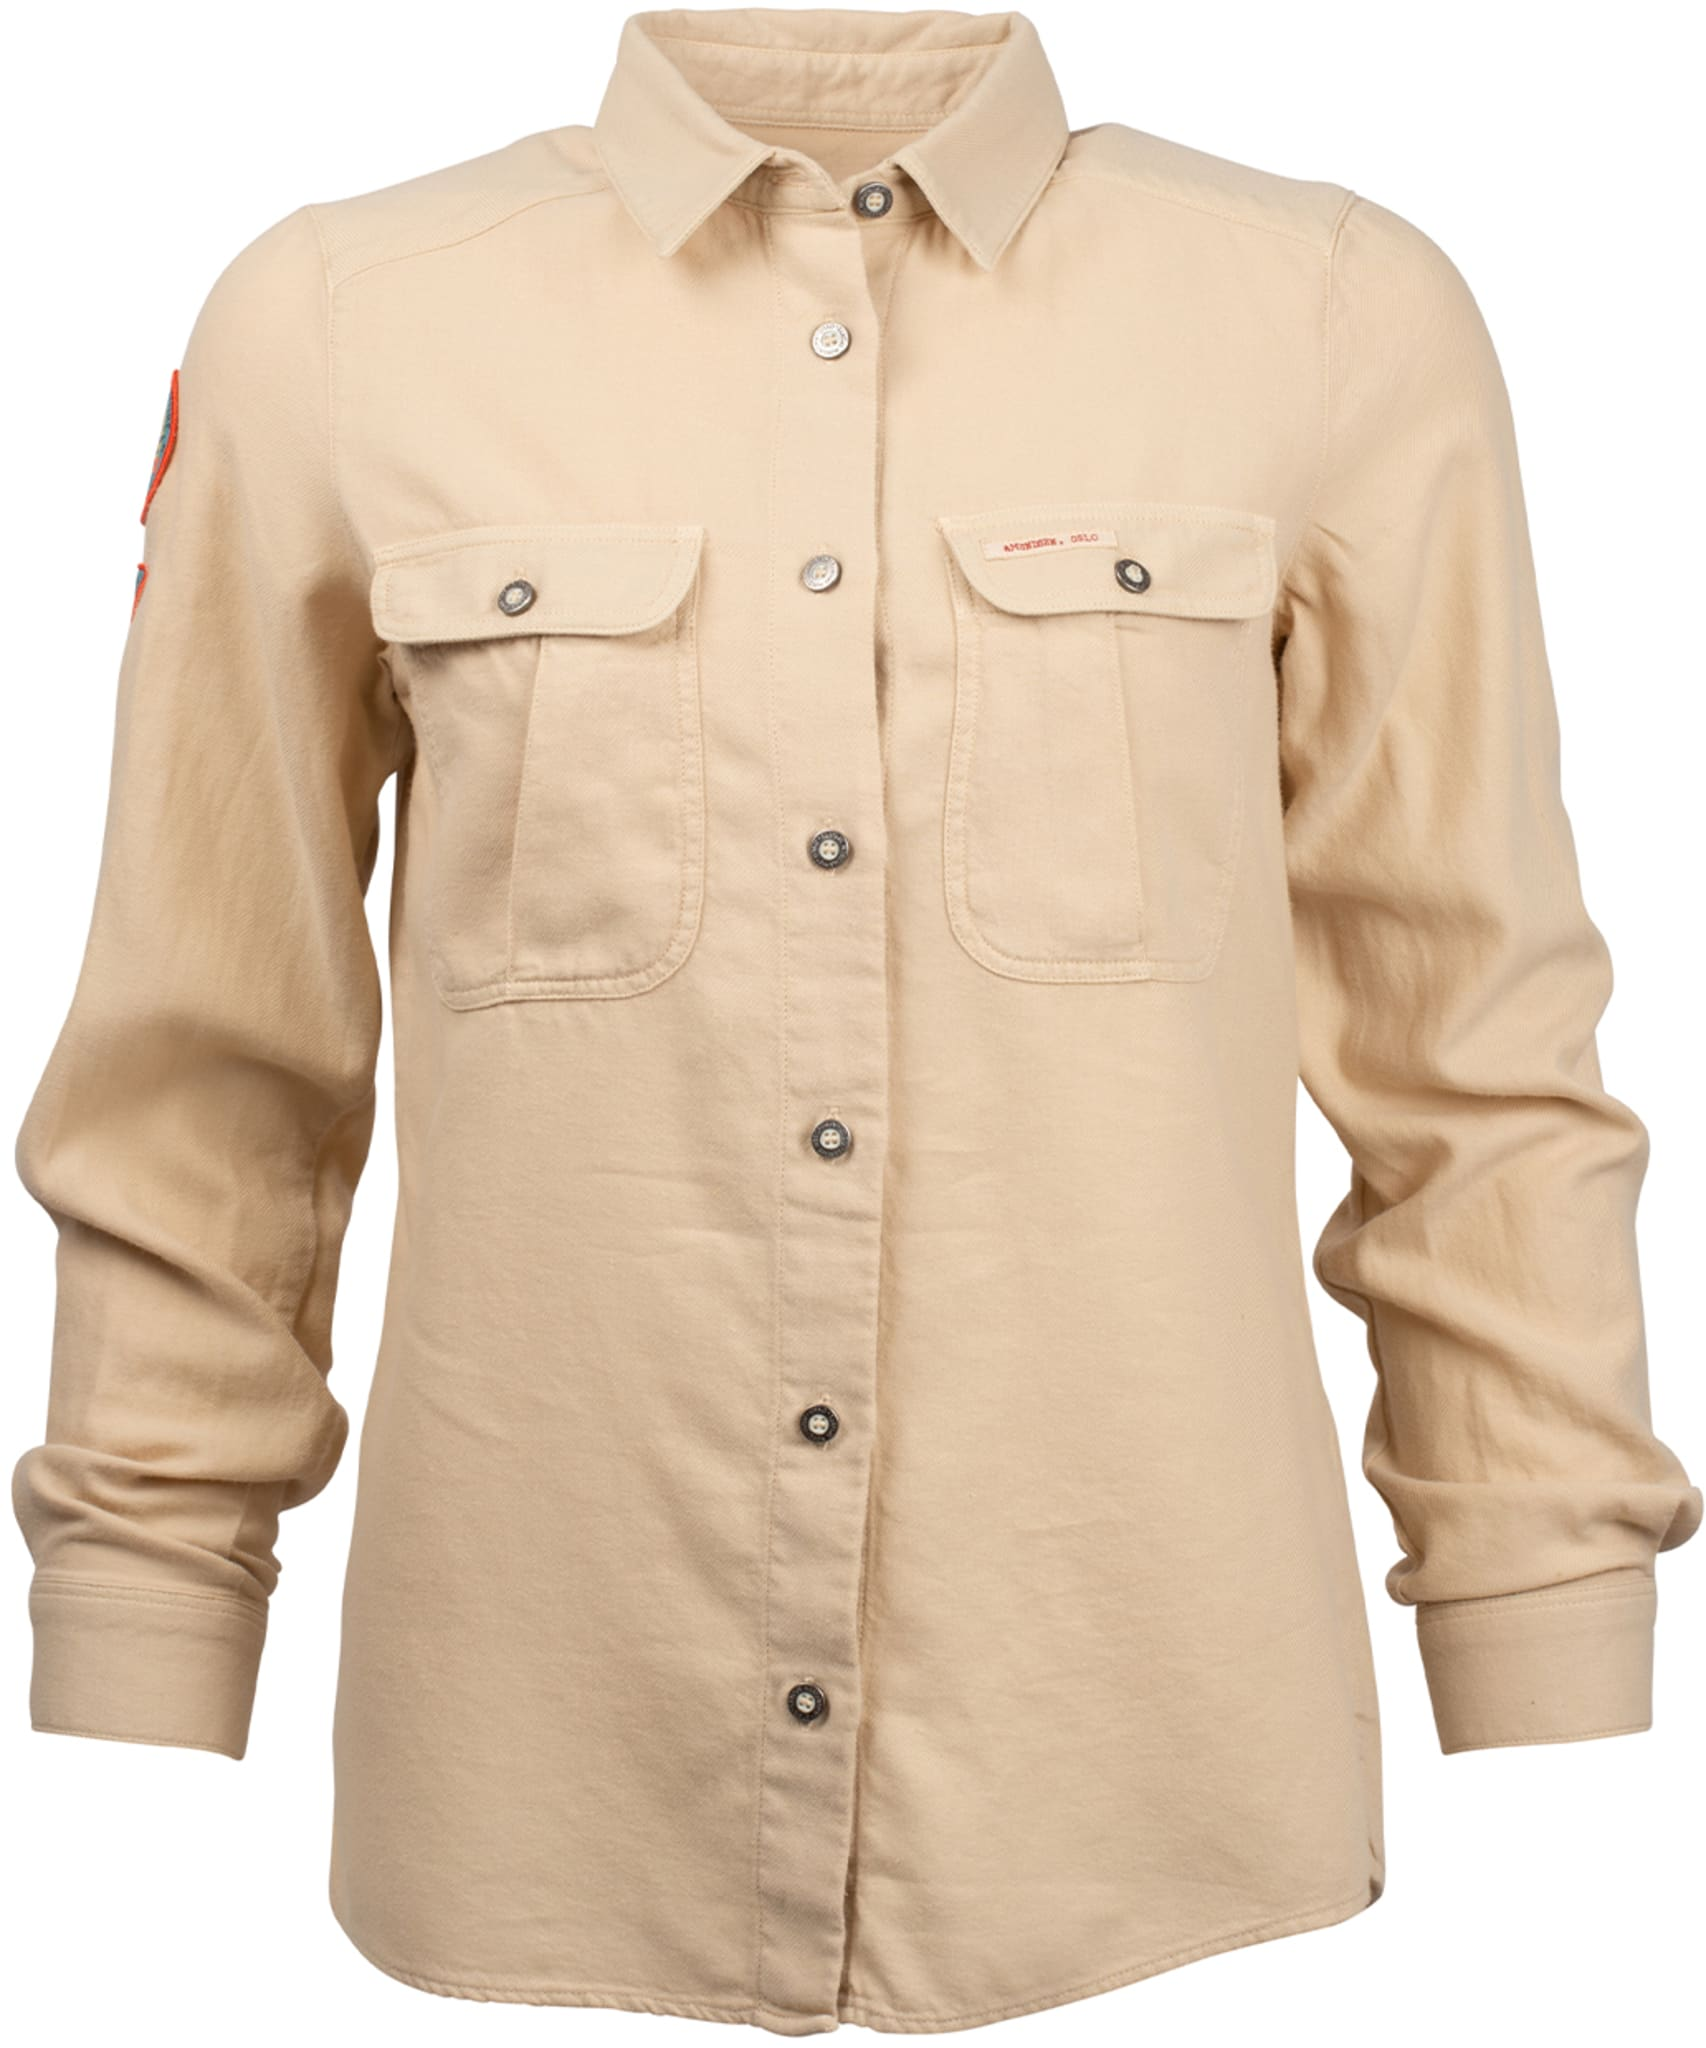 Safari Shirt Flannel Shirt Garment Dyed Womens